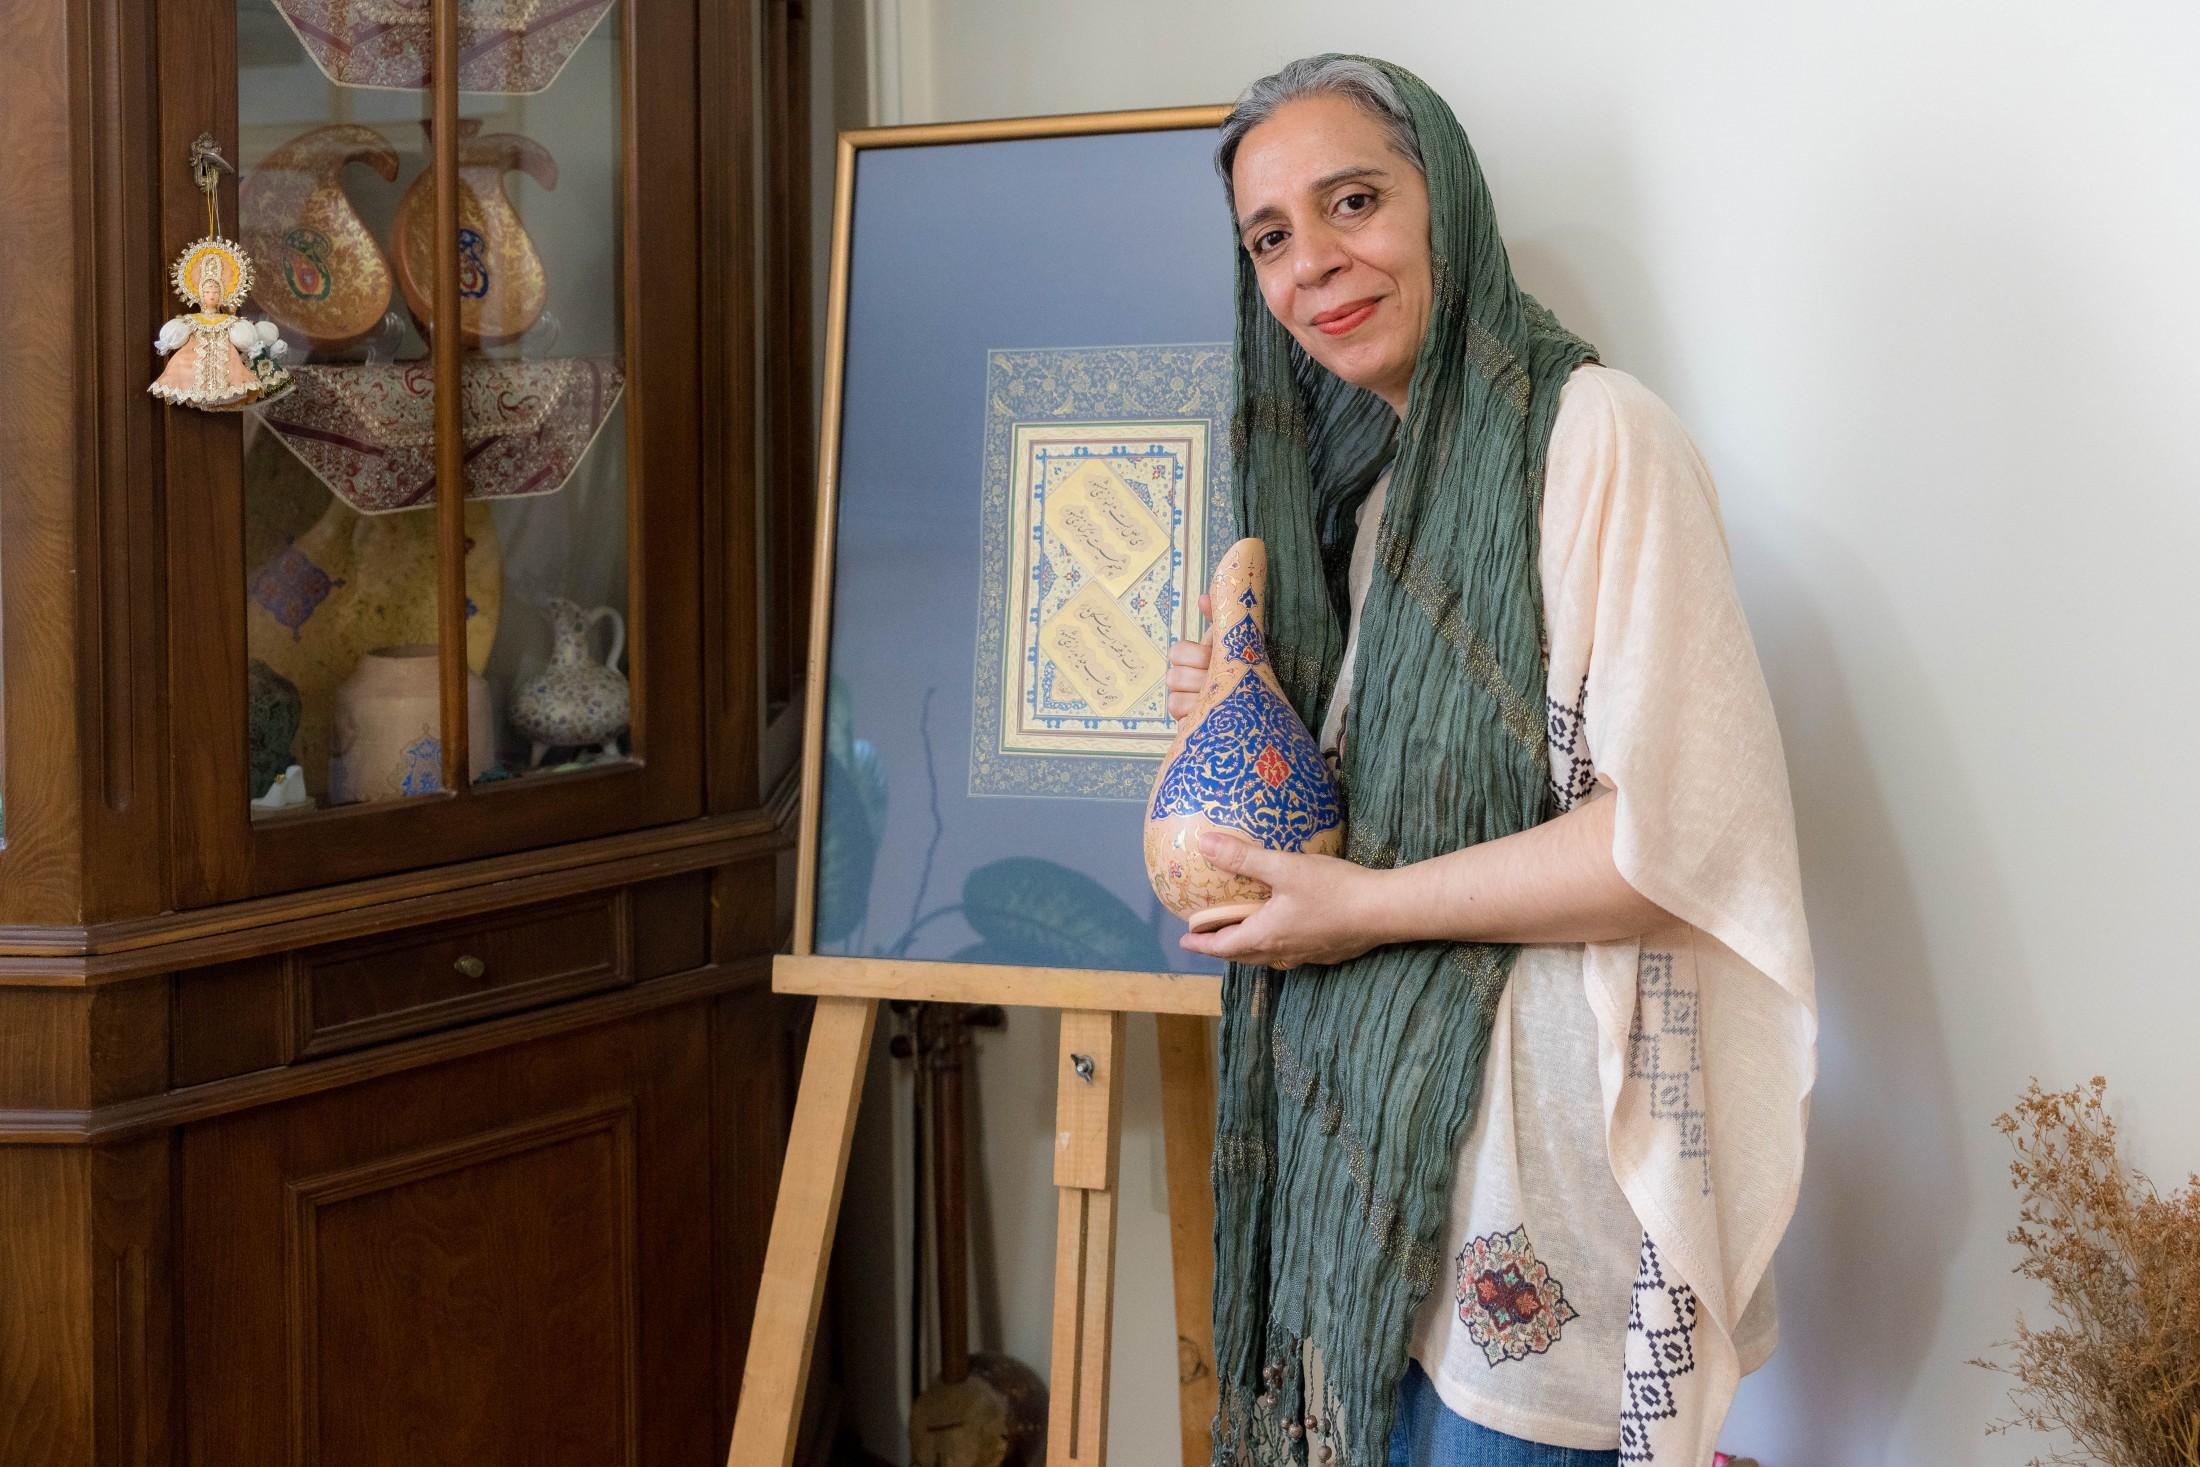 Khadijeh Masoumi's Illuminated artistry